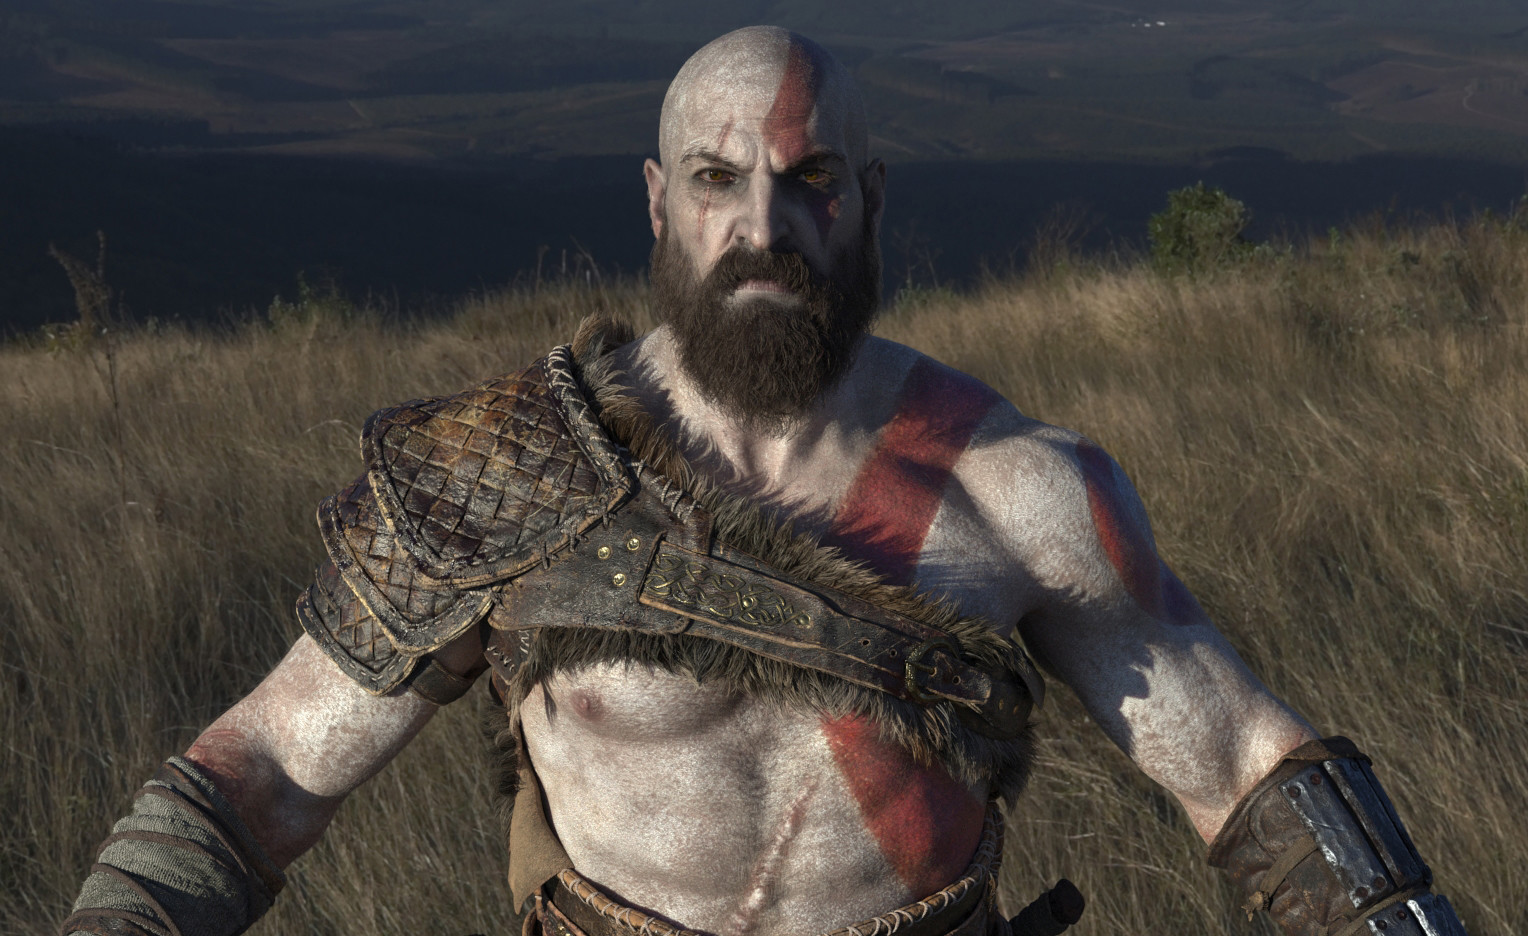 Duc Phil Nguyen God Of War Ps4 Tv Commercial Kratos